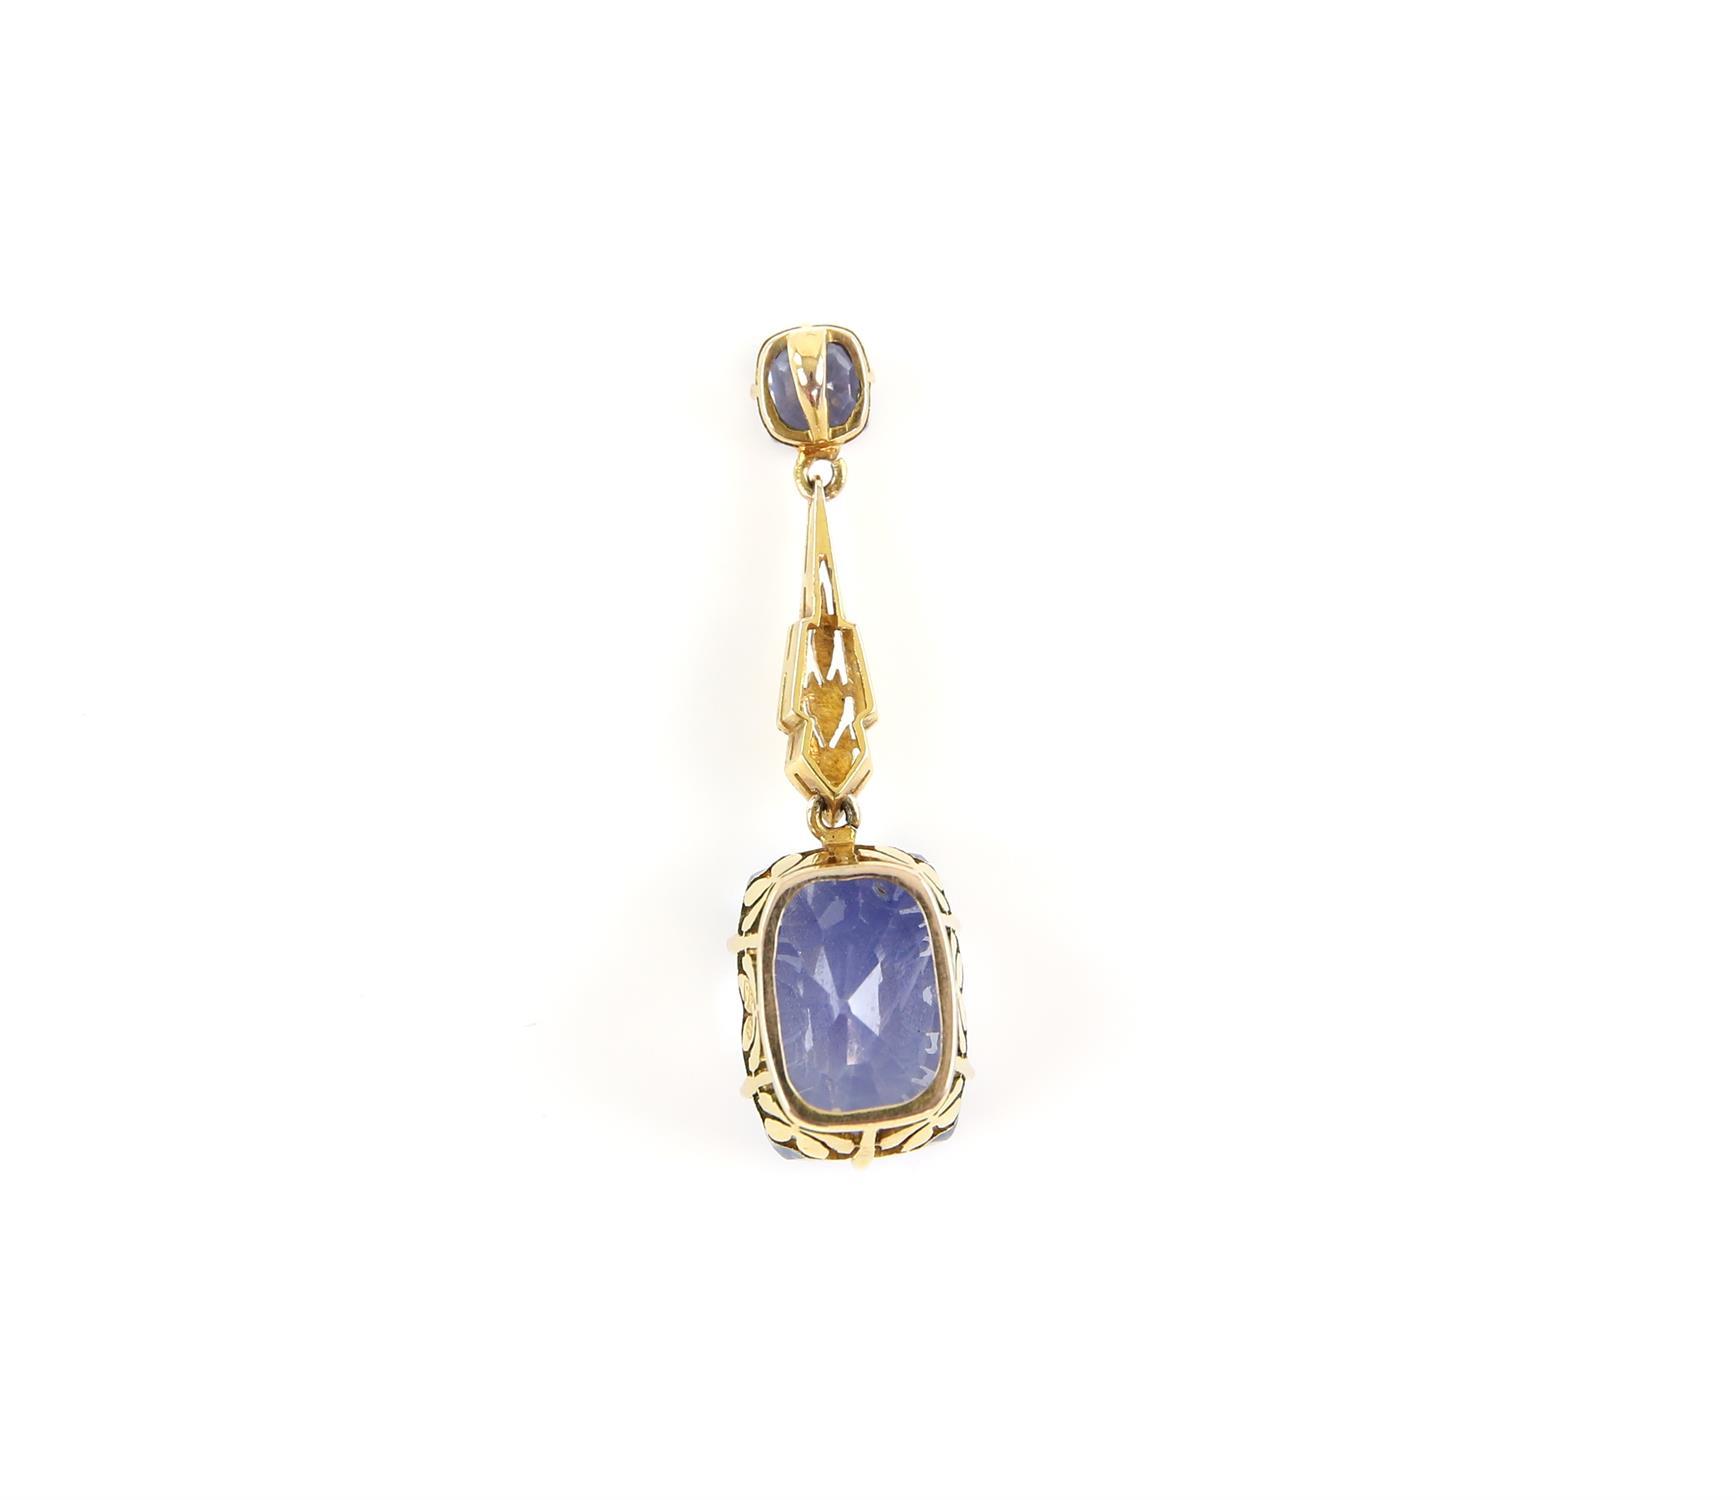 Sapphire drop pendant, principal light blue sapphire, estimated weight 12.99 carats, - Image 2 of 8